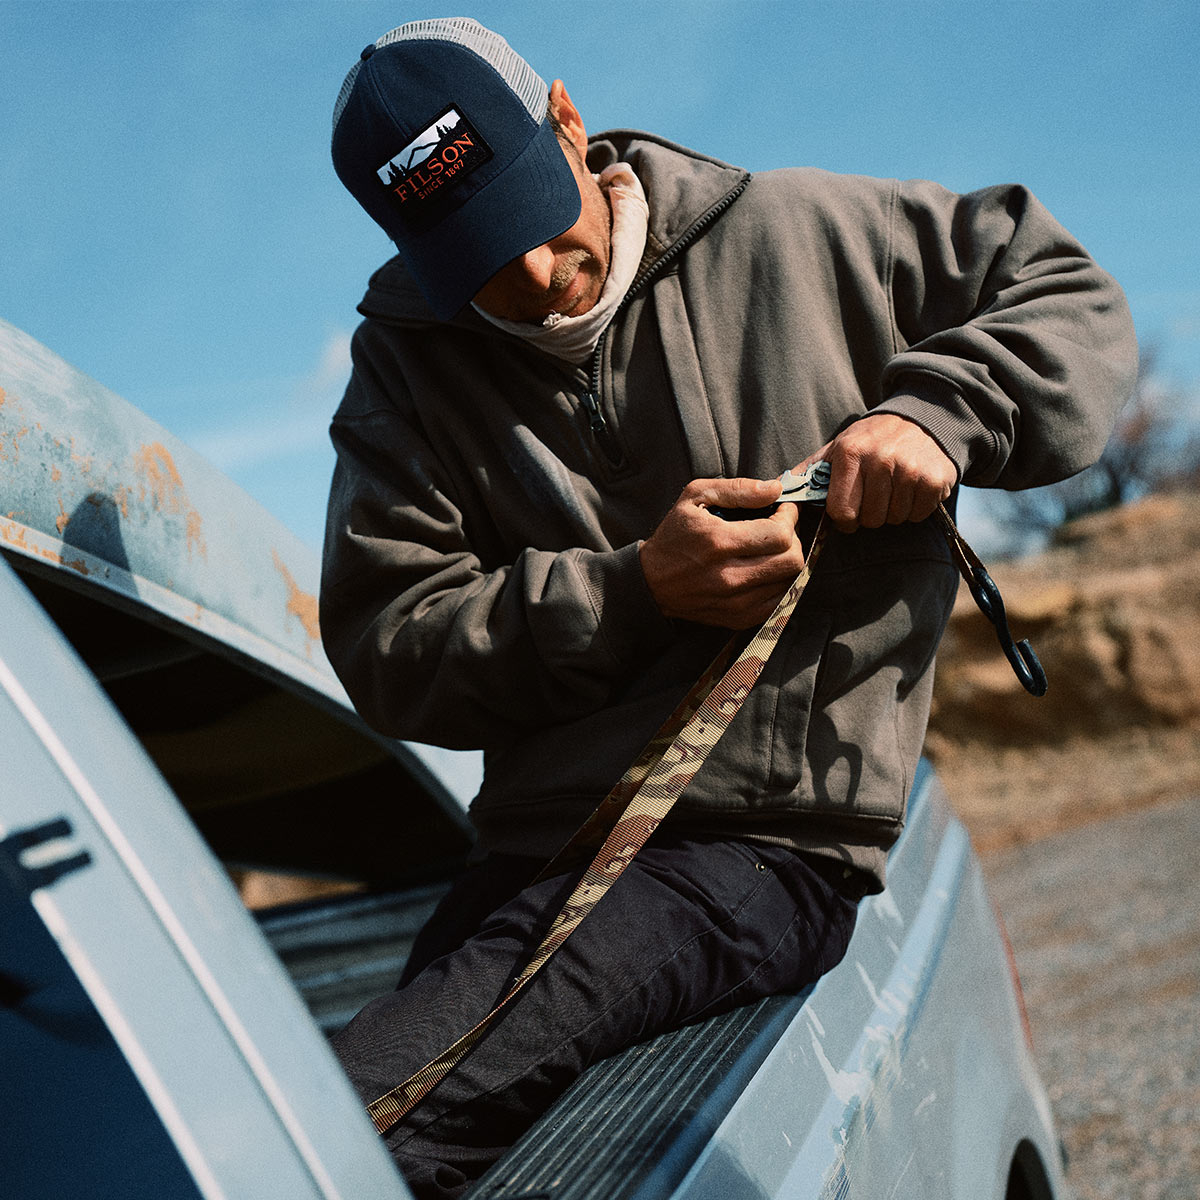 Filson Mesh Logger Cap 20157135-Navy, durable cap with breathable sun protection